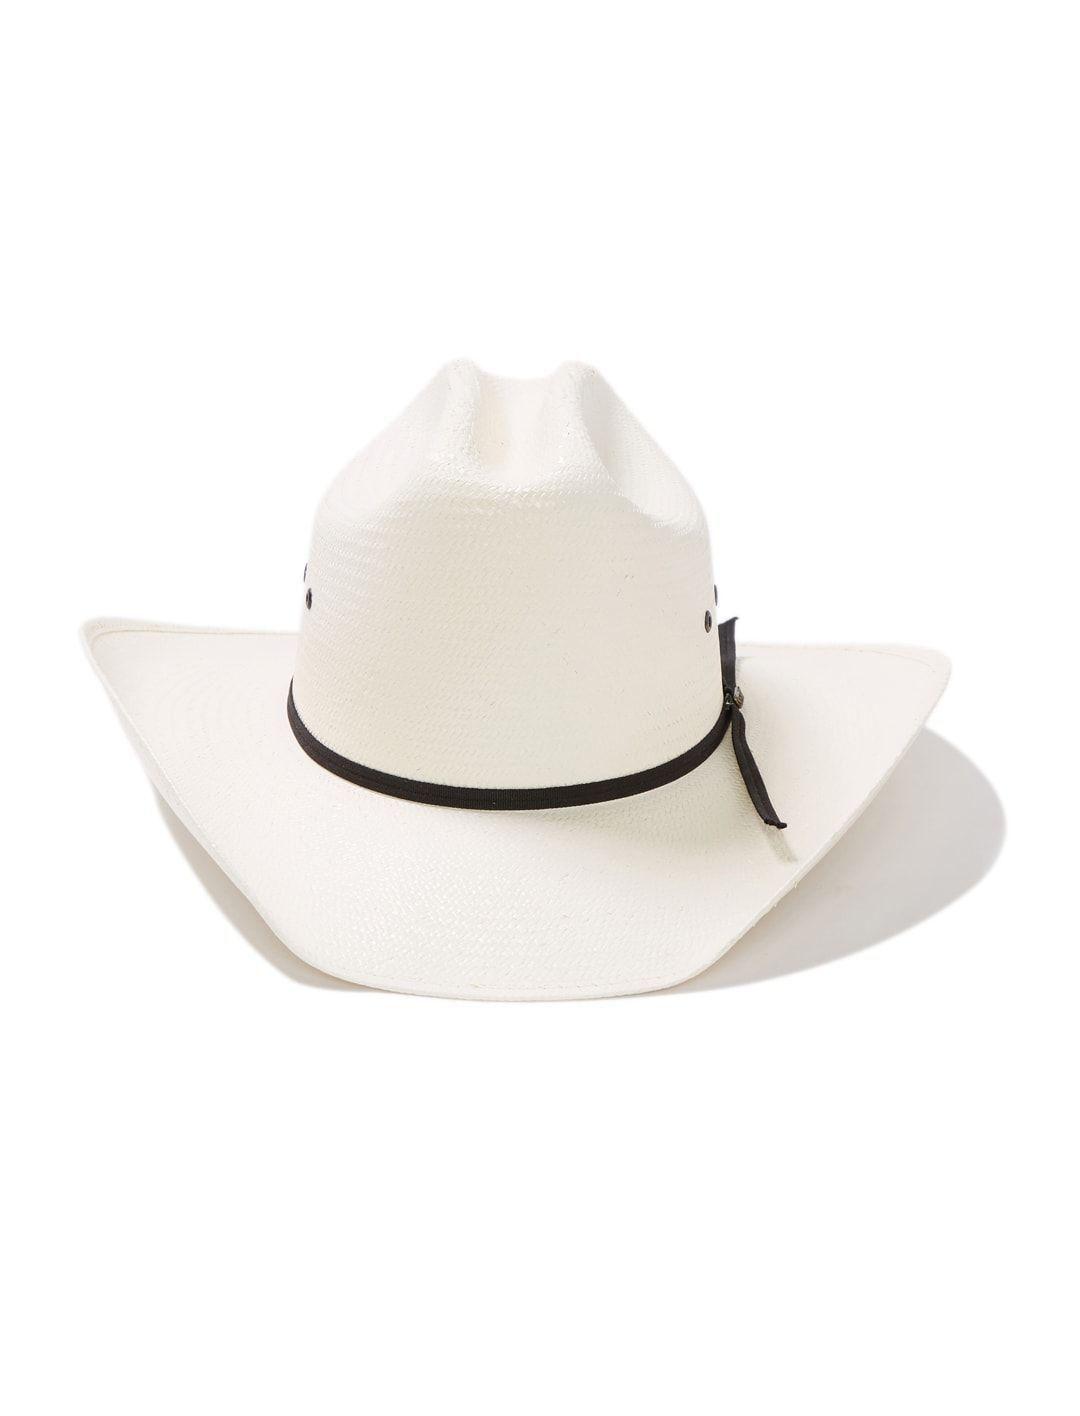 Stetson Men s Rodeo Jr. Youth Straw Cowboy Hat SSROJRB234 3471fcbcf70